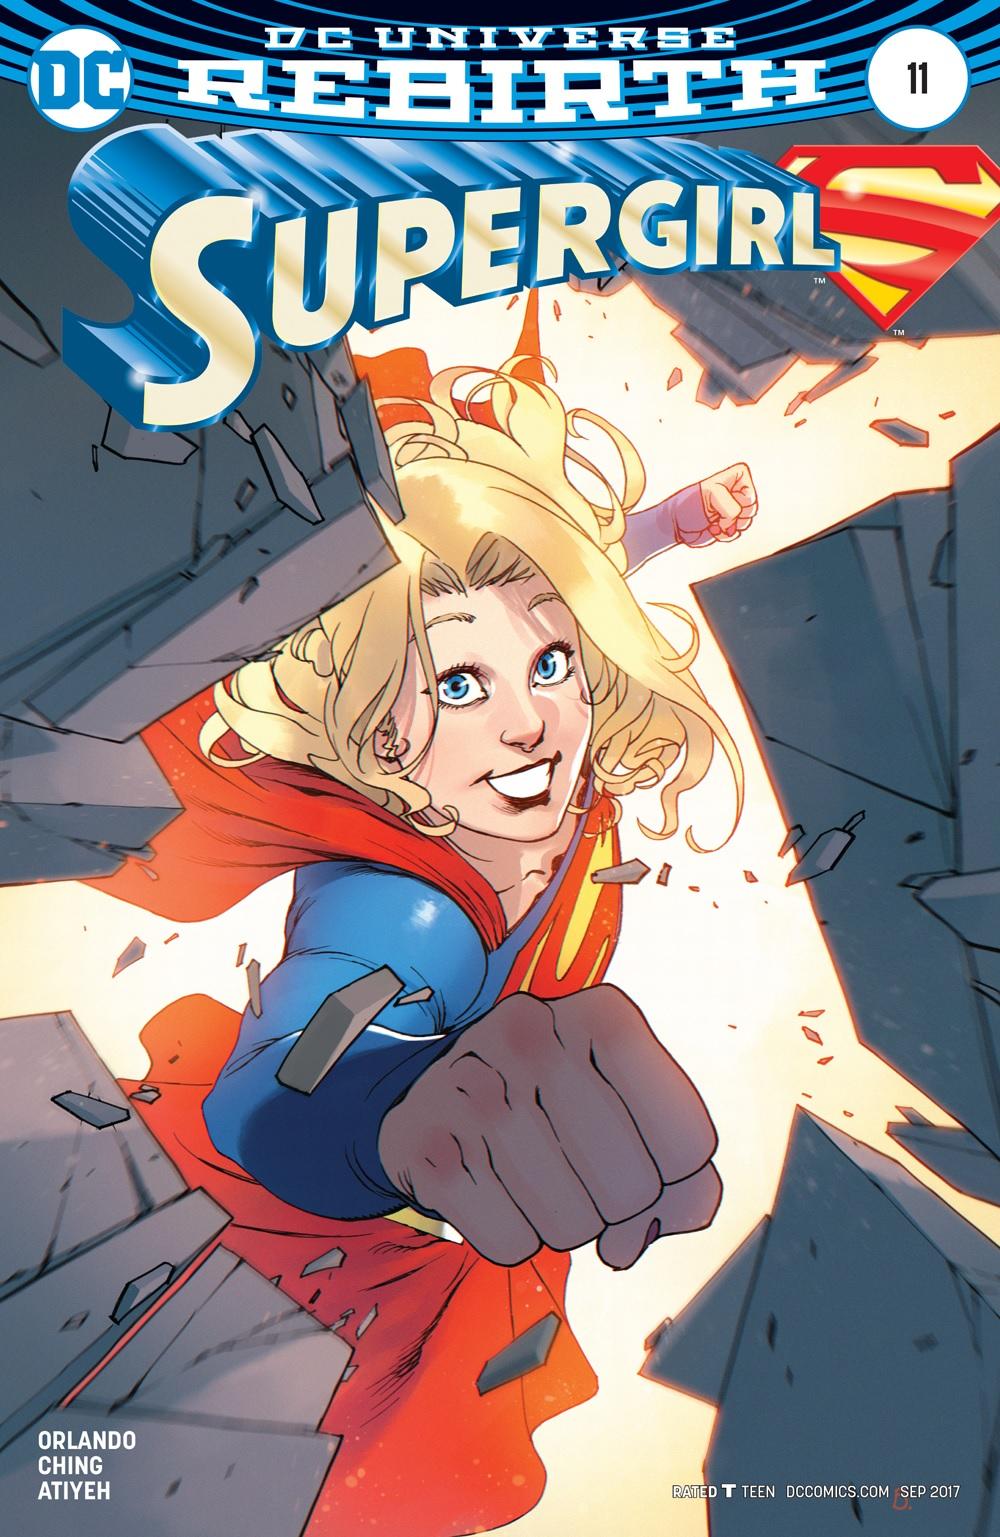 Supergirl Vol 7 11 Variant.jpg